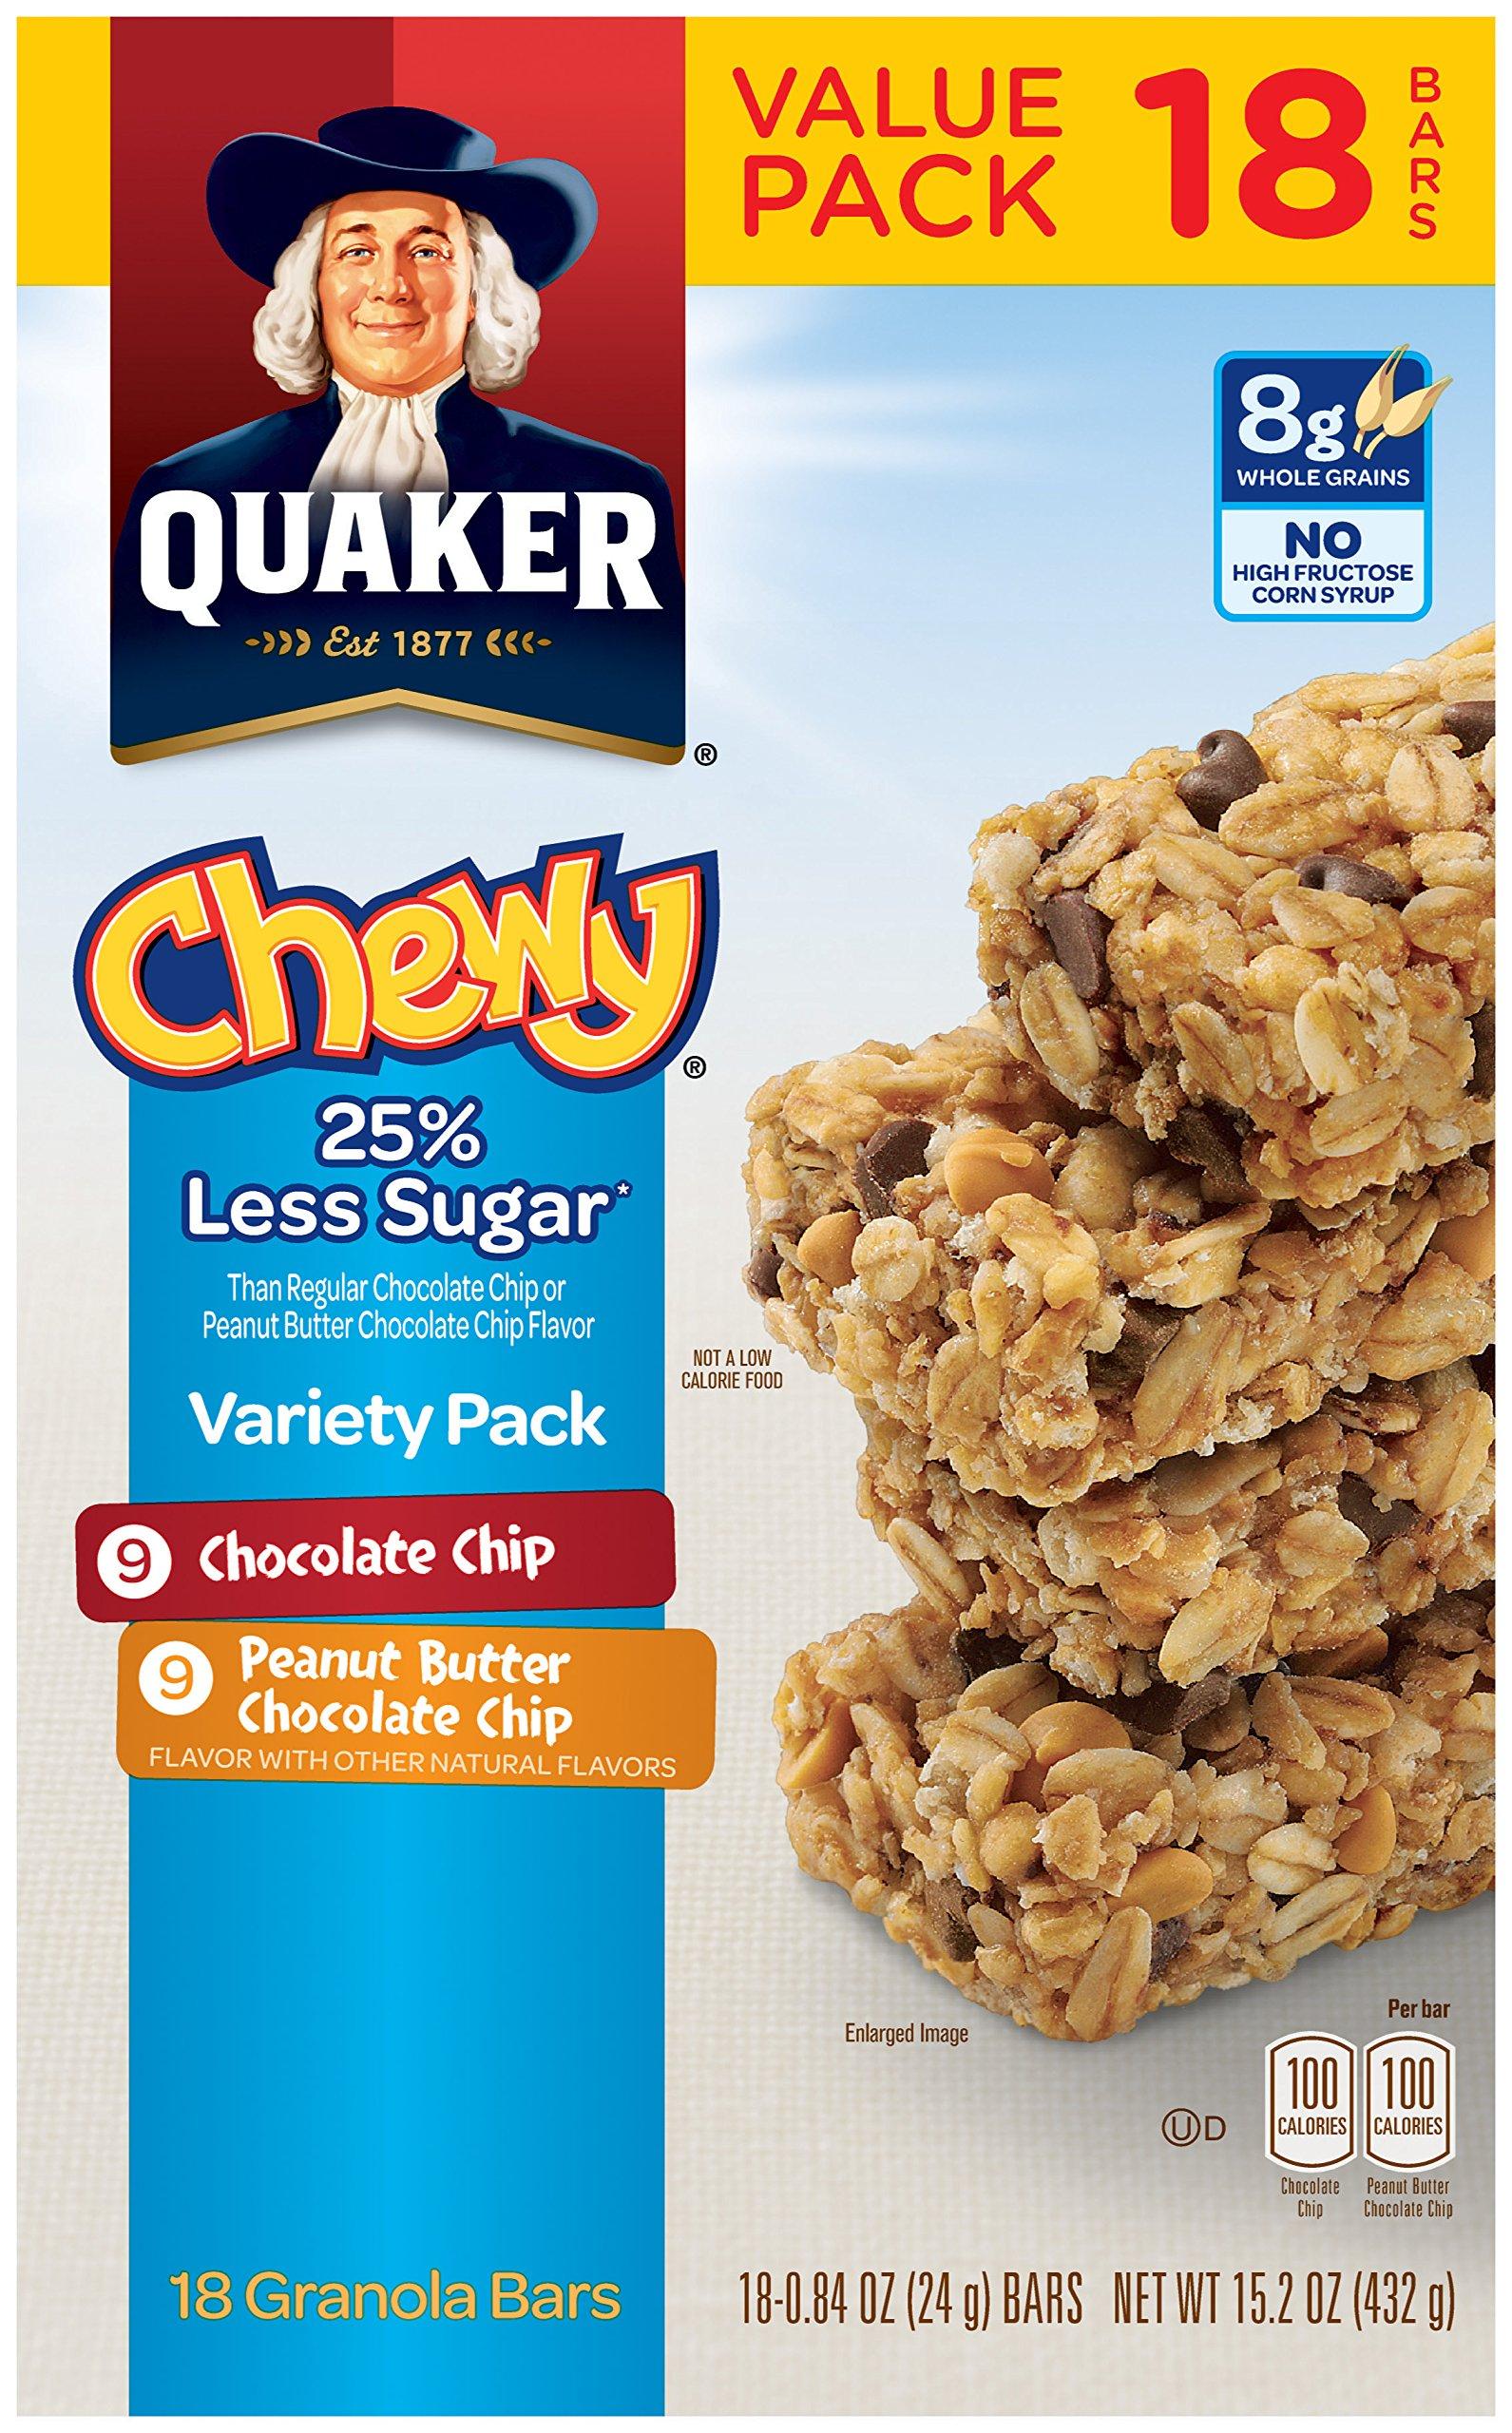 No sugar granola bars